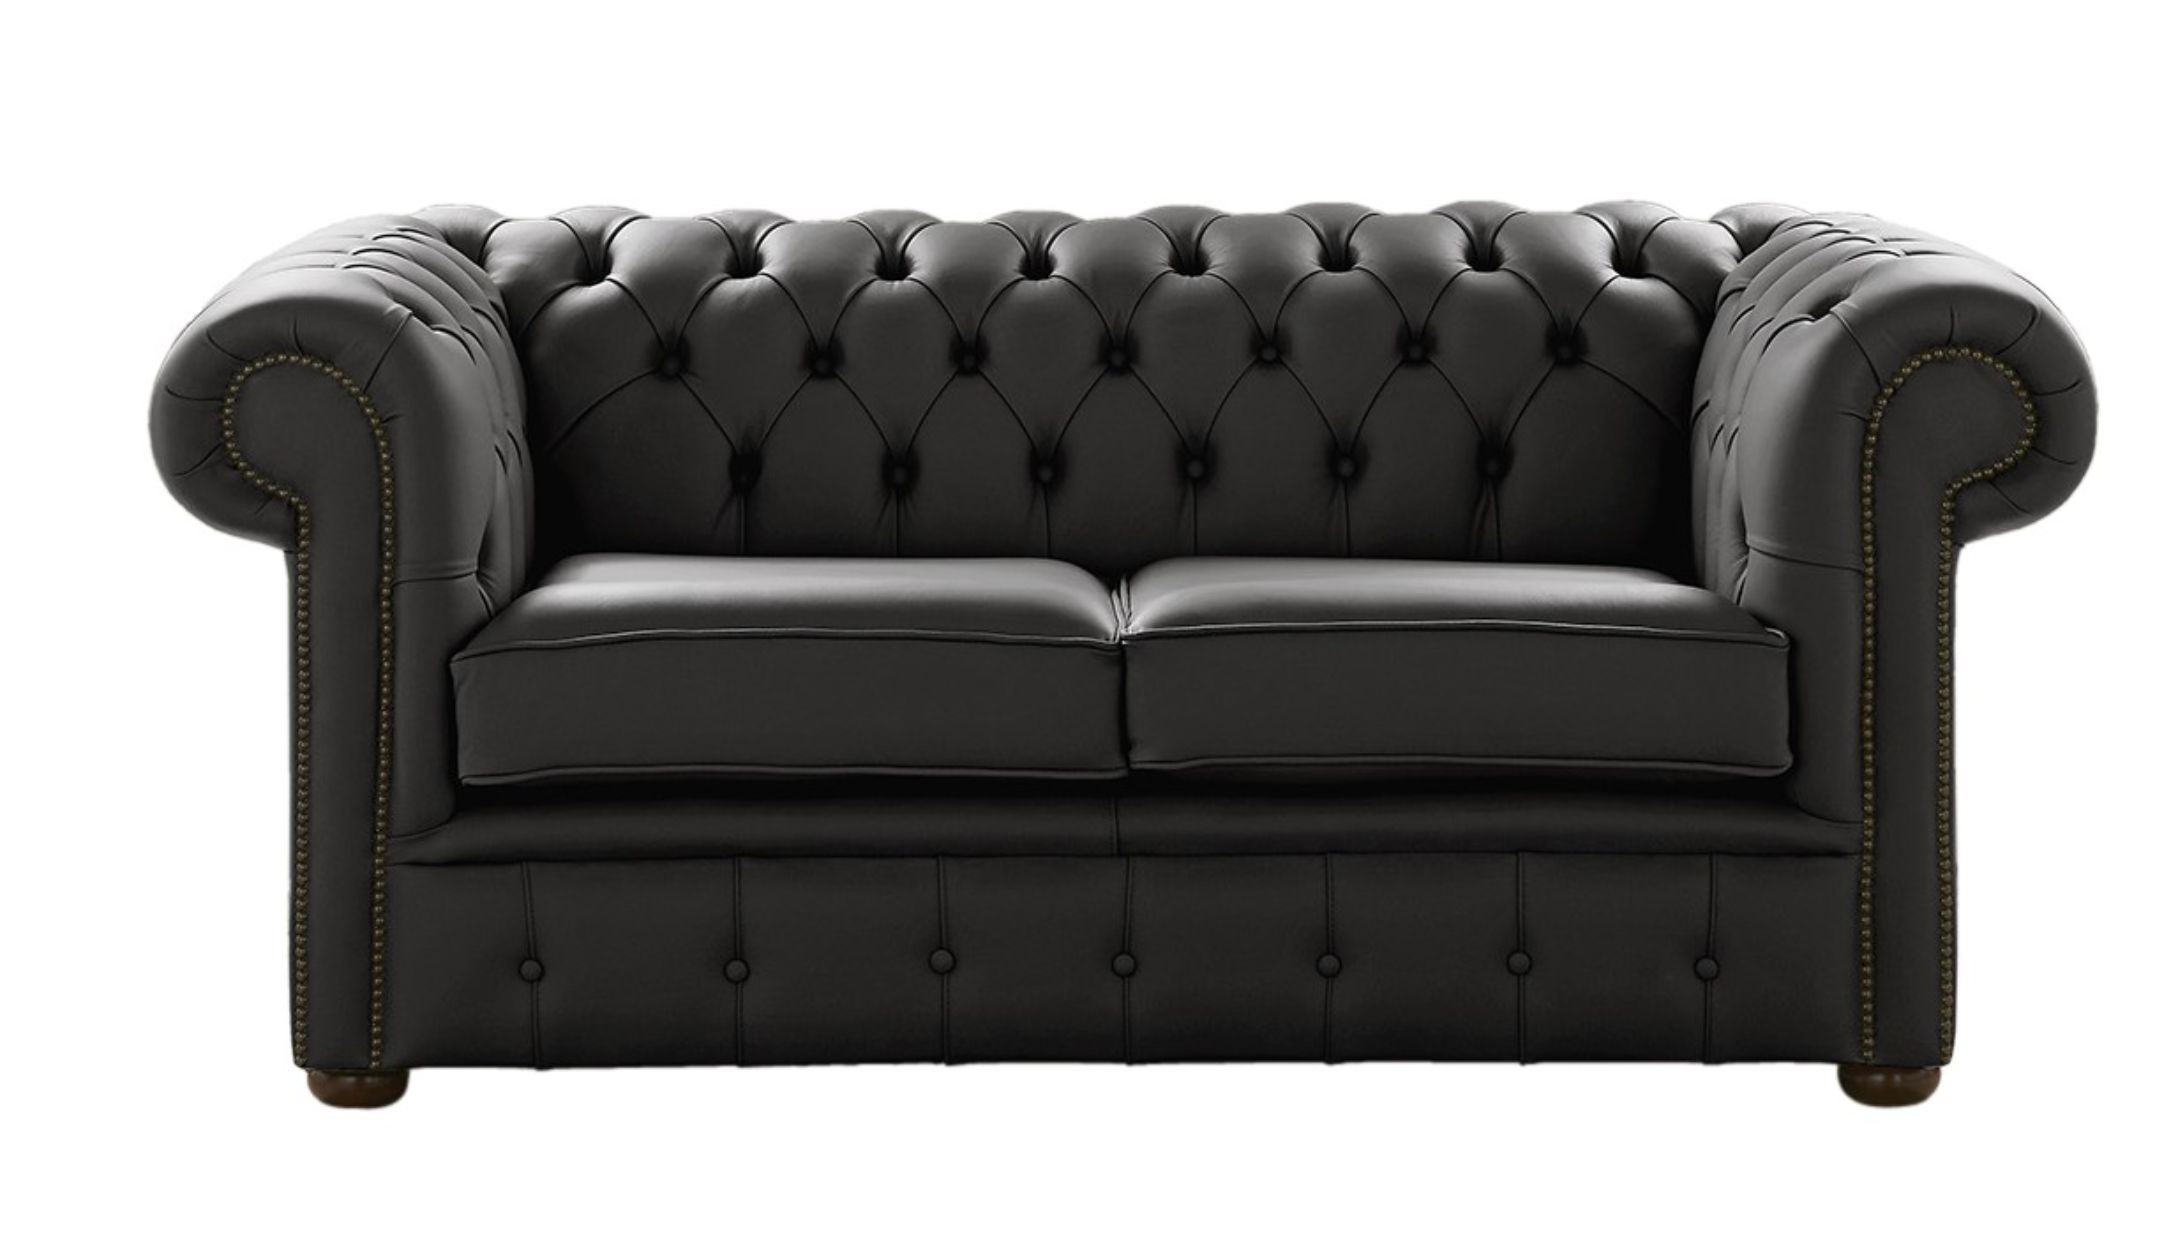 designersofas4u black leather chesterfield sofa. Black Bedroom Furniture Sets. Home Design Ideas